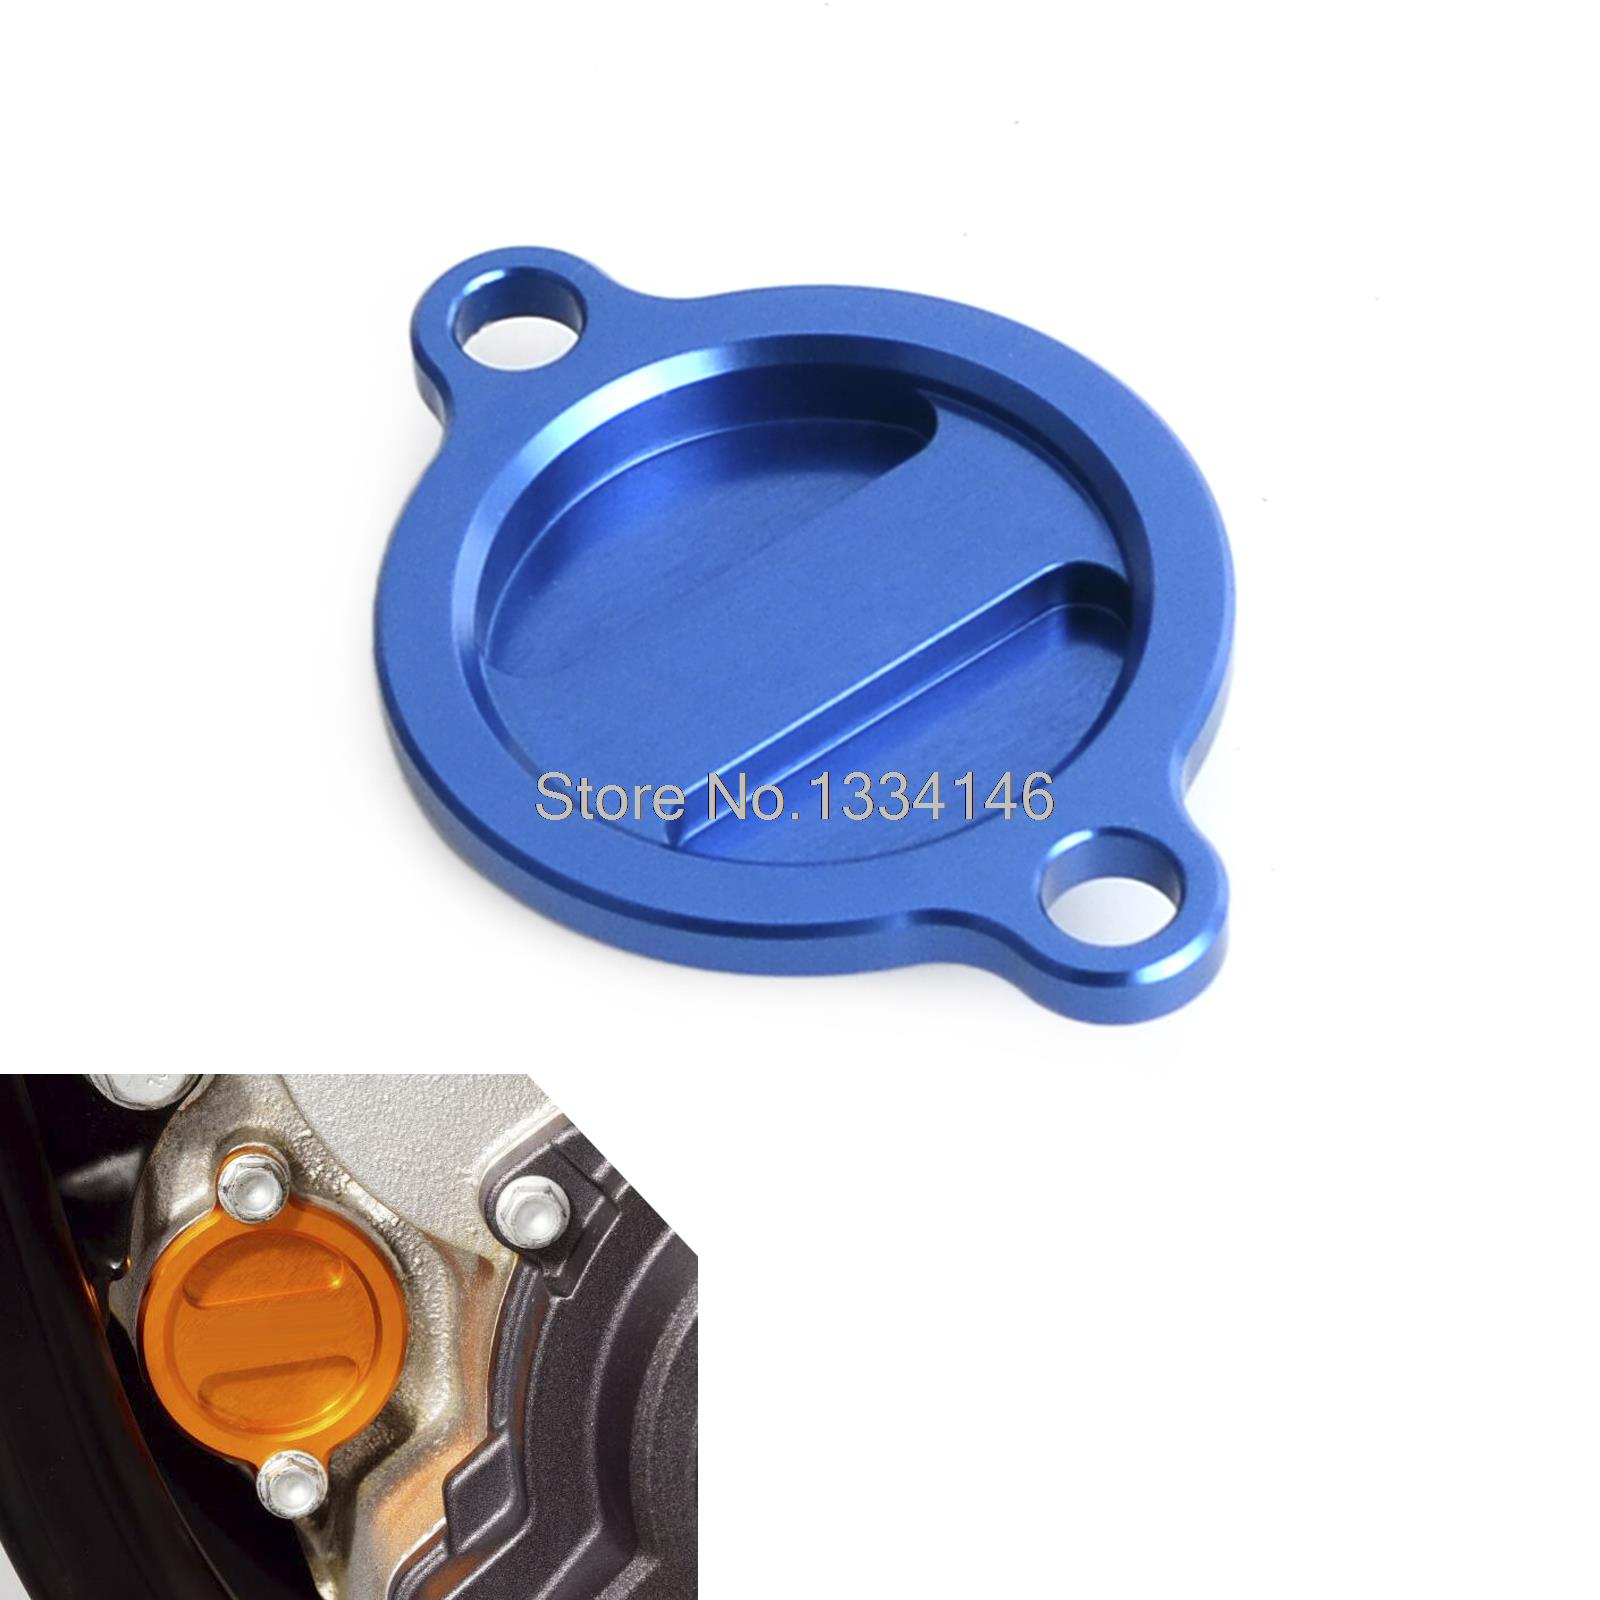 Factory Oil Filter Cover Fits For Husqvarna FC/FE 250/350 2014-2016, FE 350 S 2015